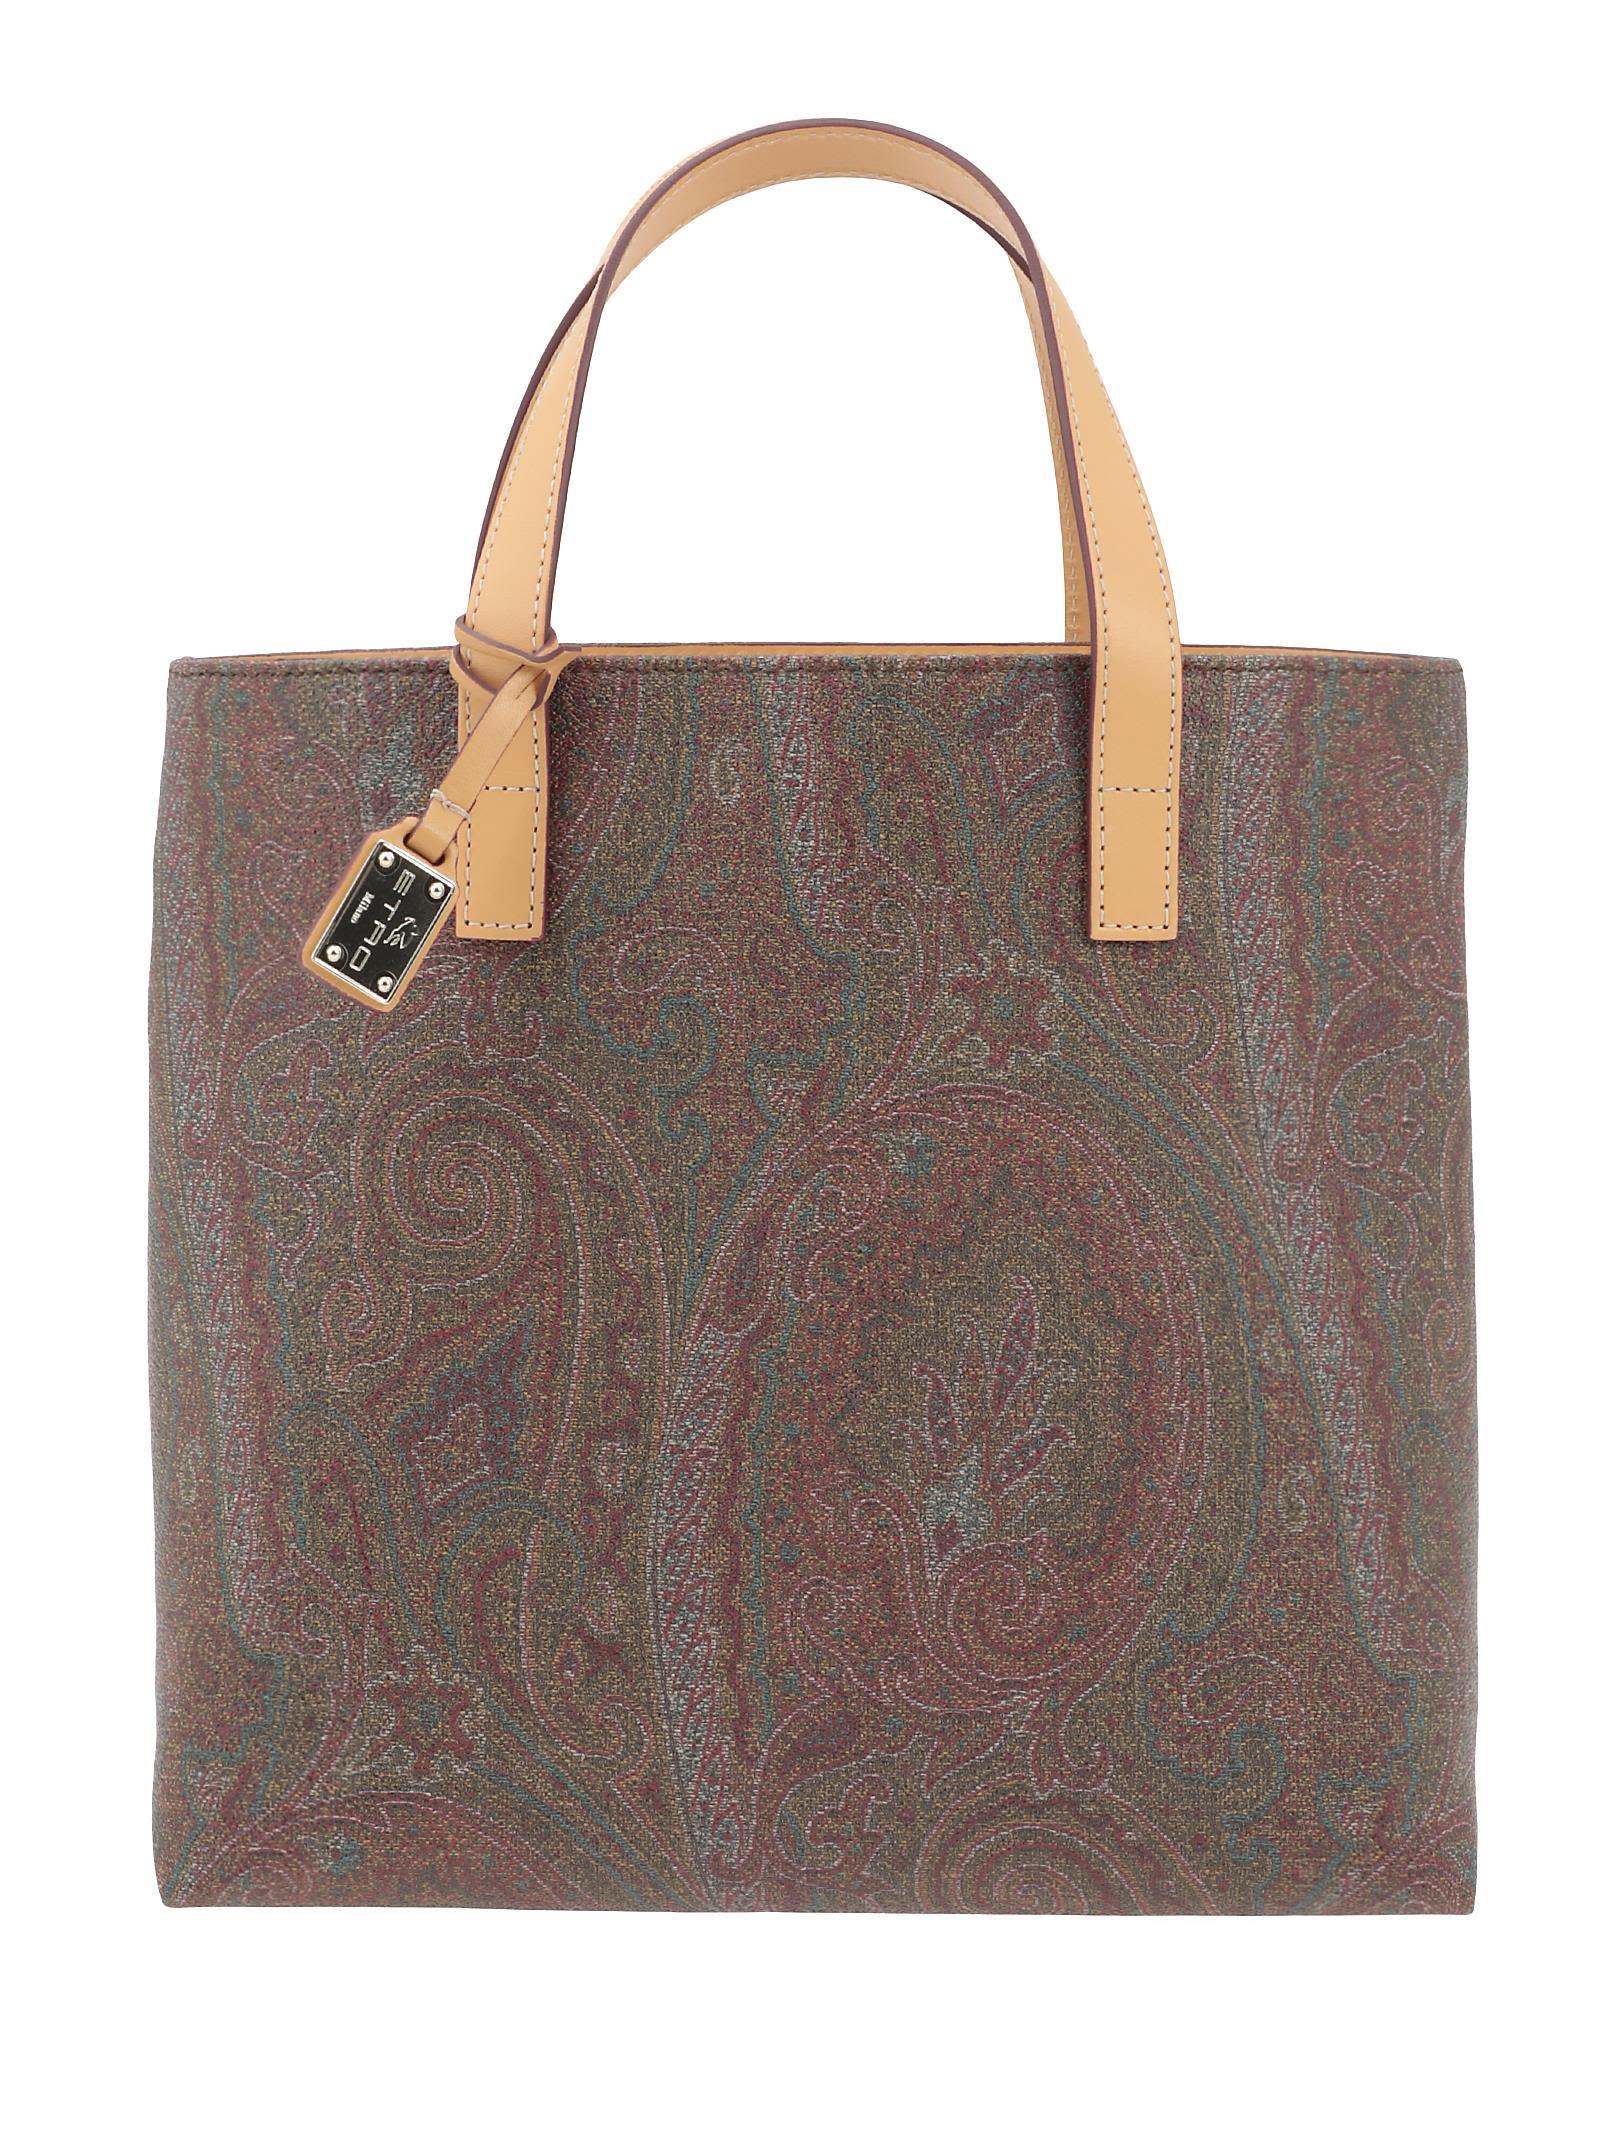 Etro Paisley Patterned Bag